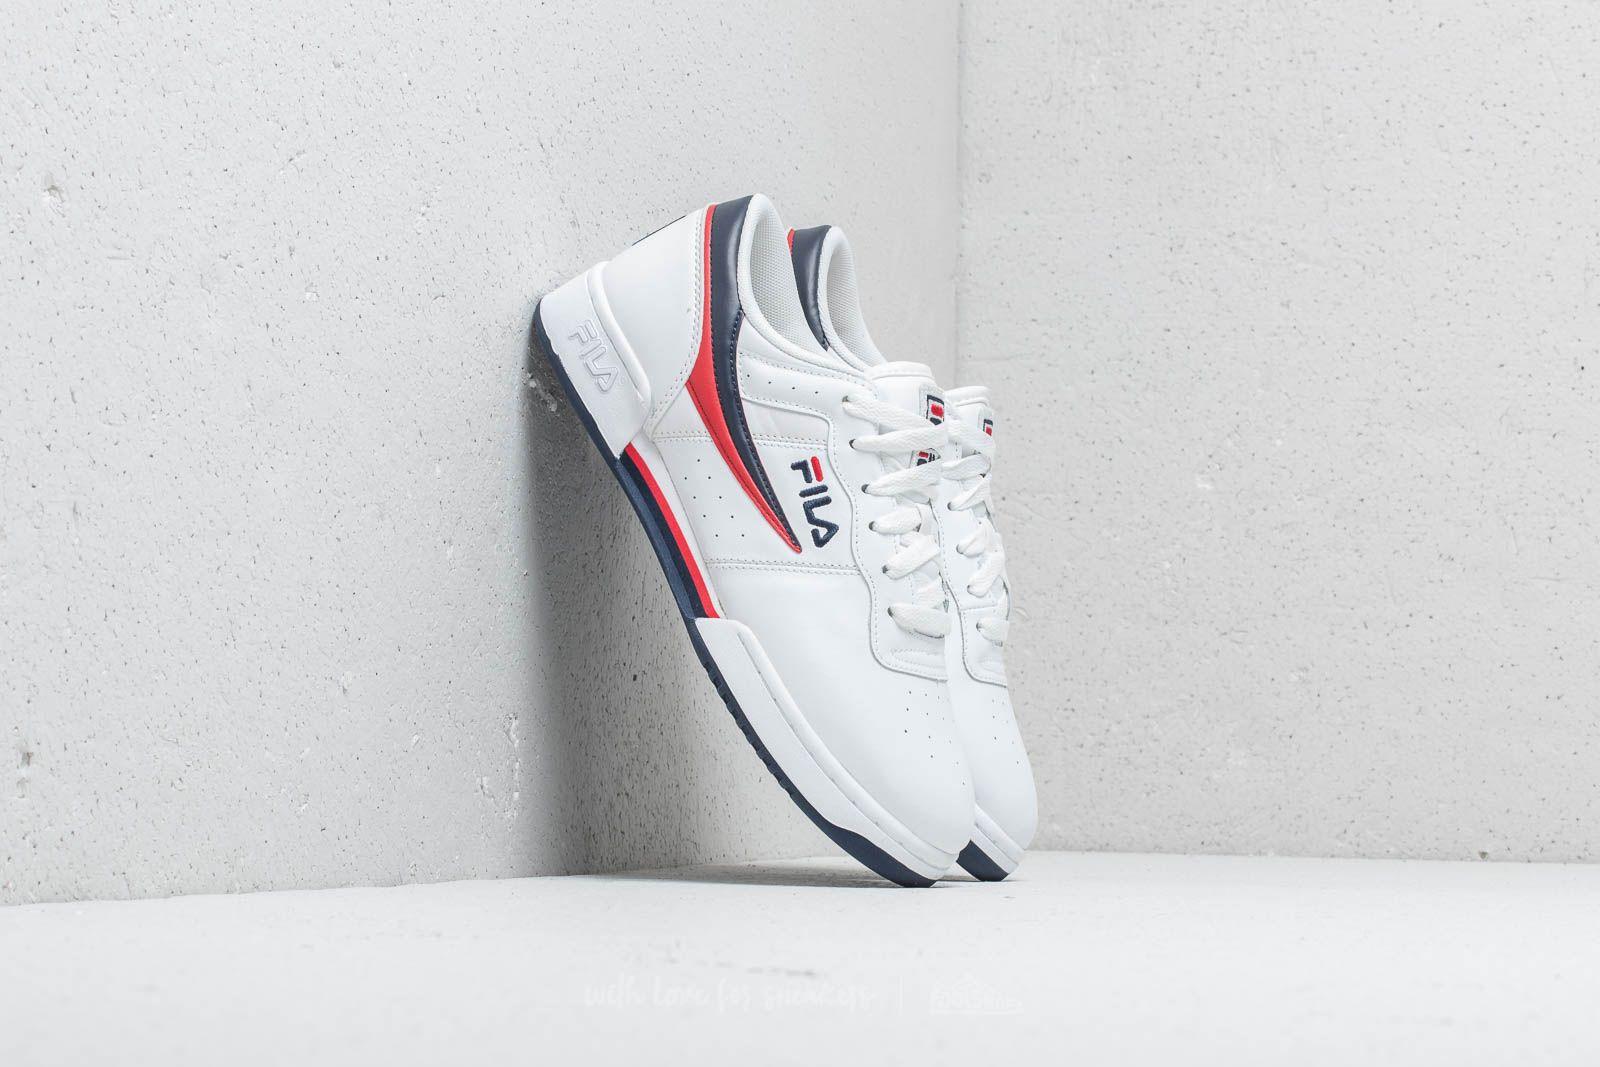 Pánské tenisky a boty Fila Original Fitness White / Fila Navy / Fila Red